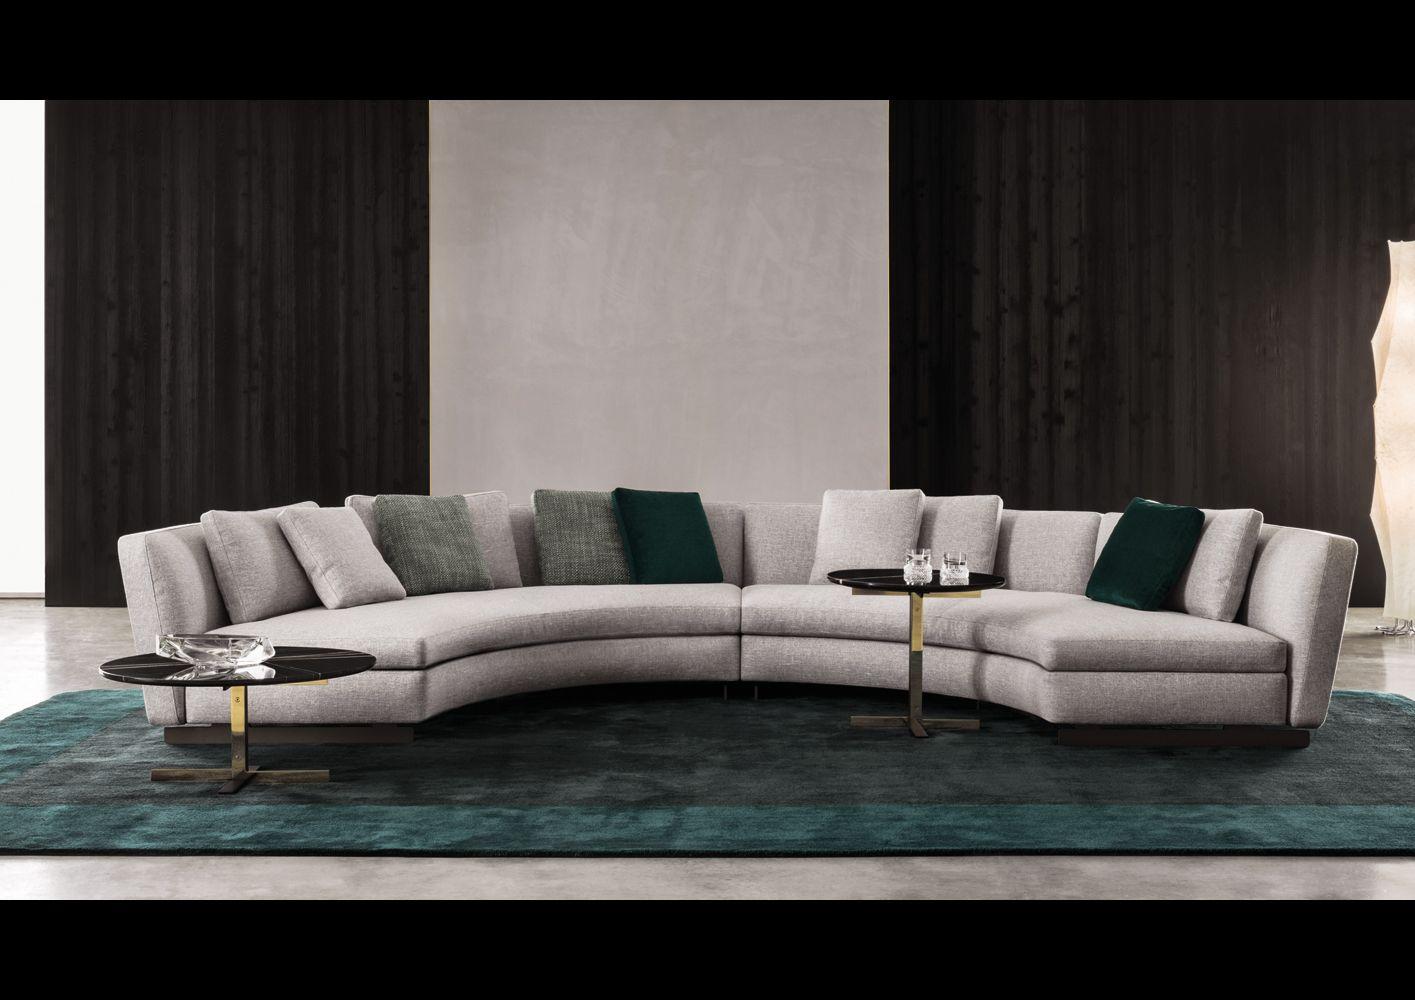 Seymor sofa by Minotti